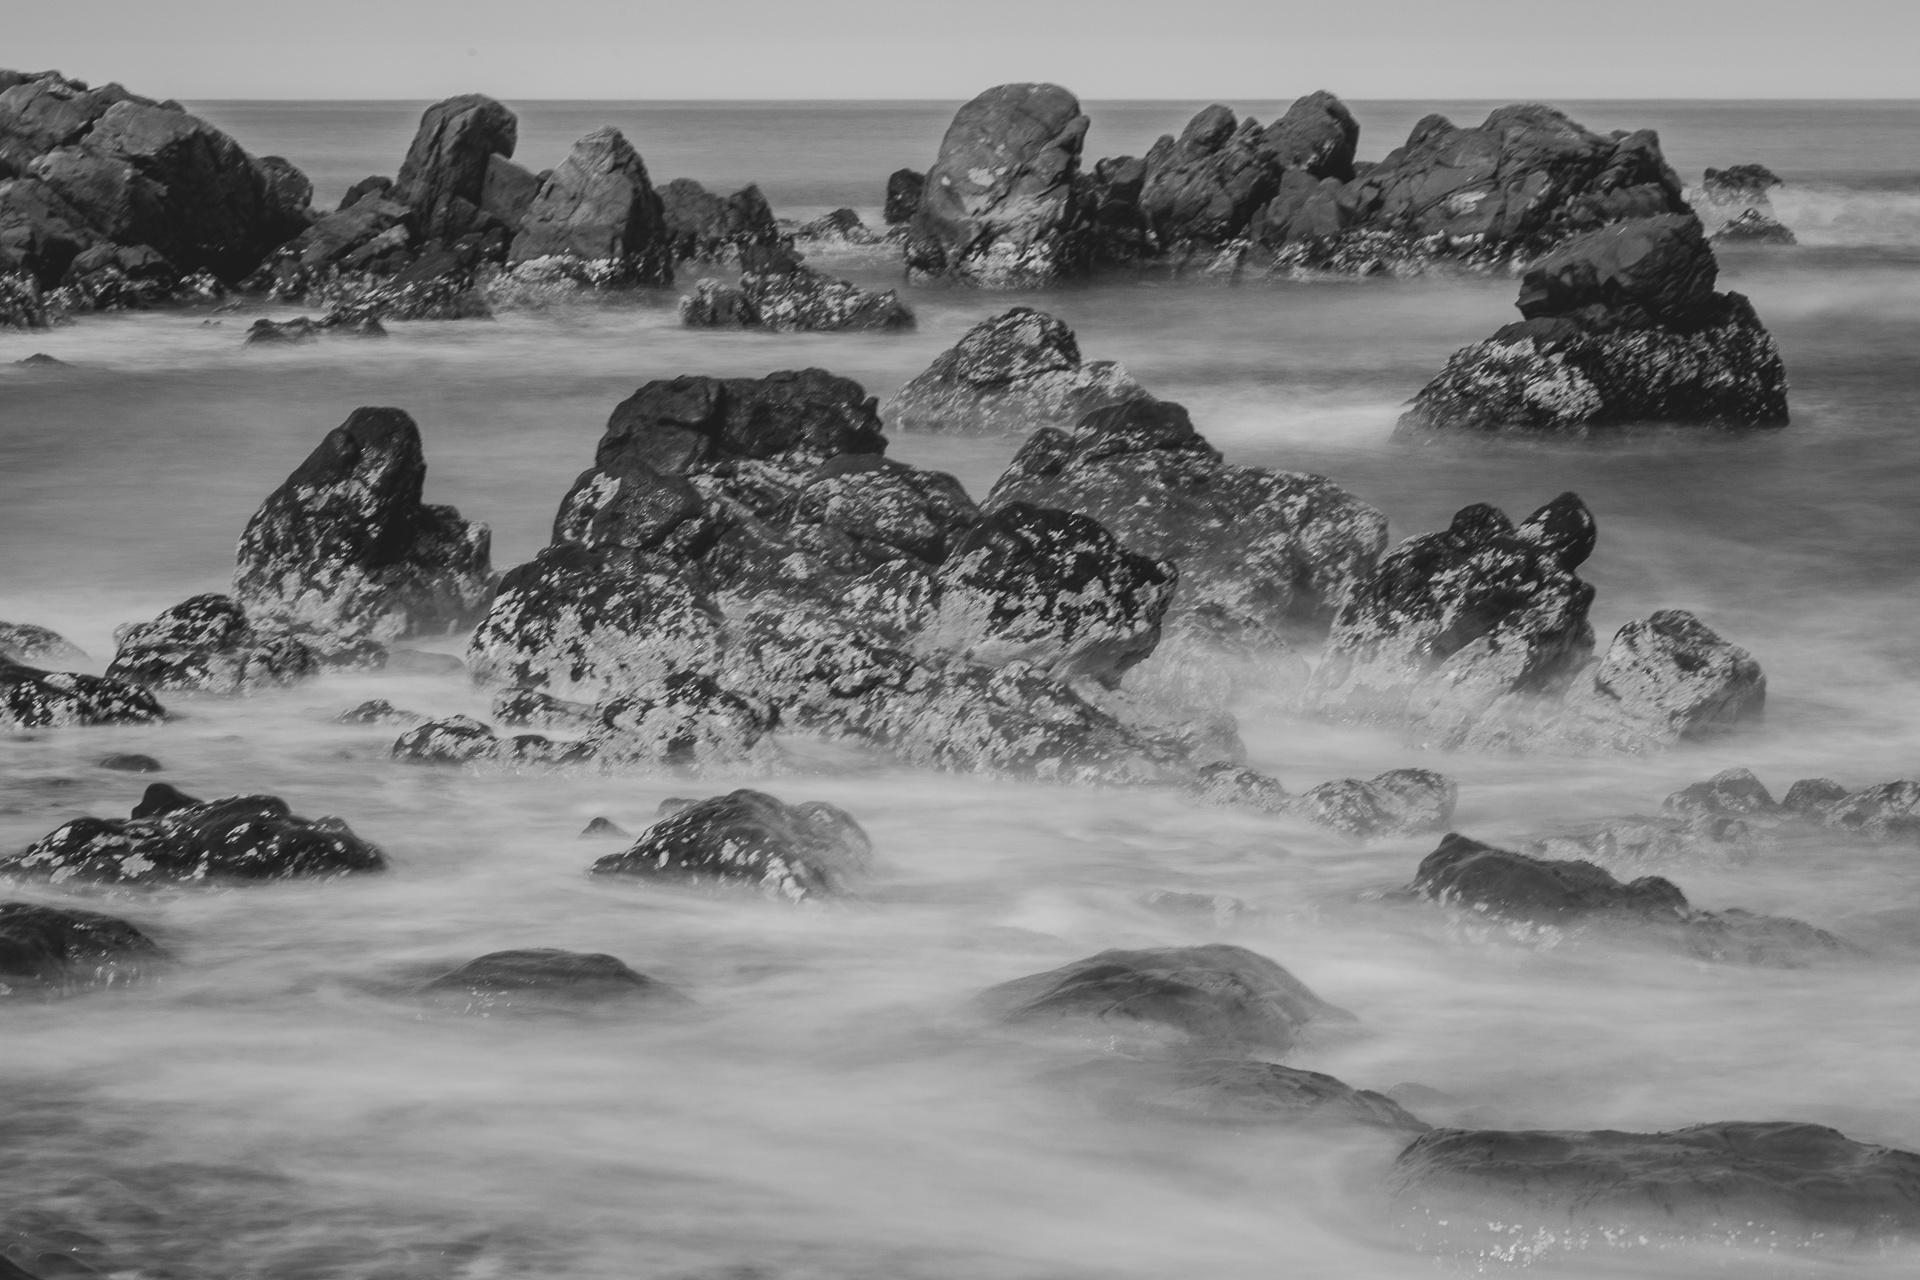 Sea and rocks in Kaikoura